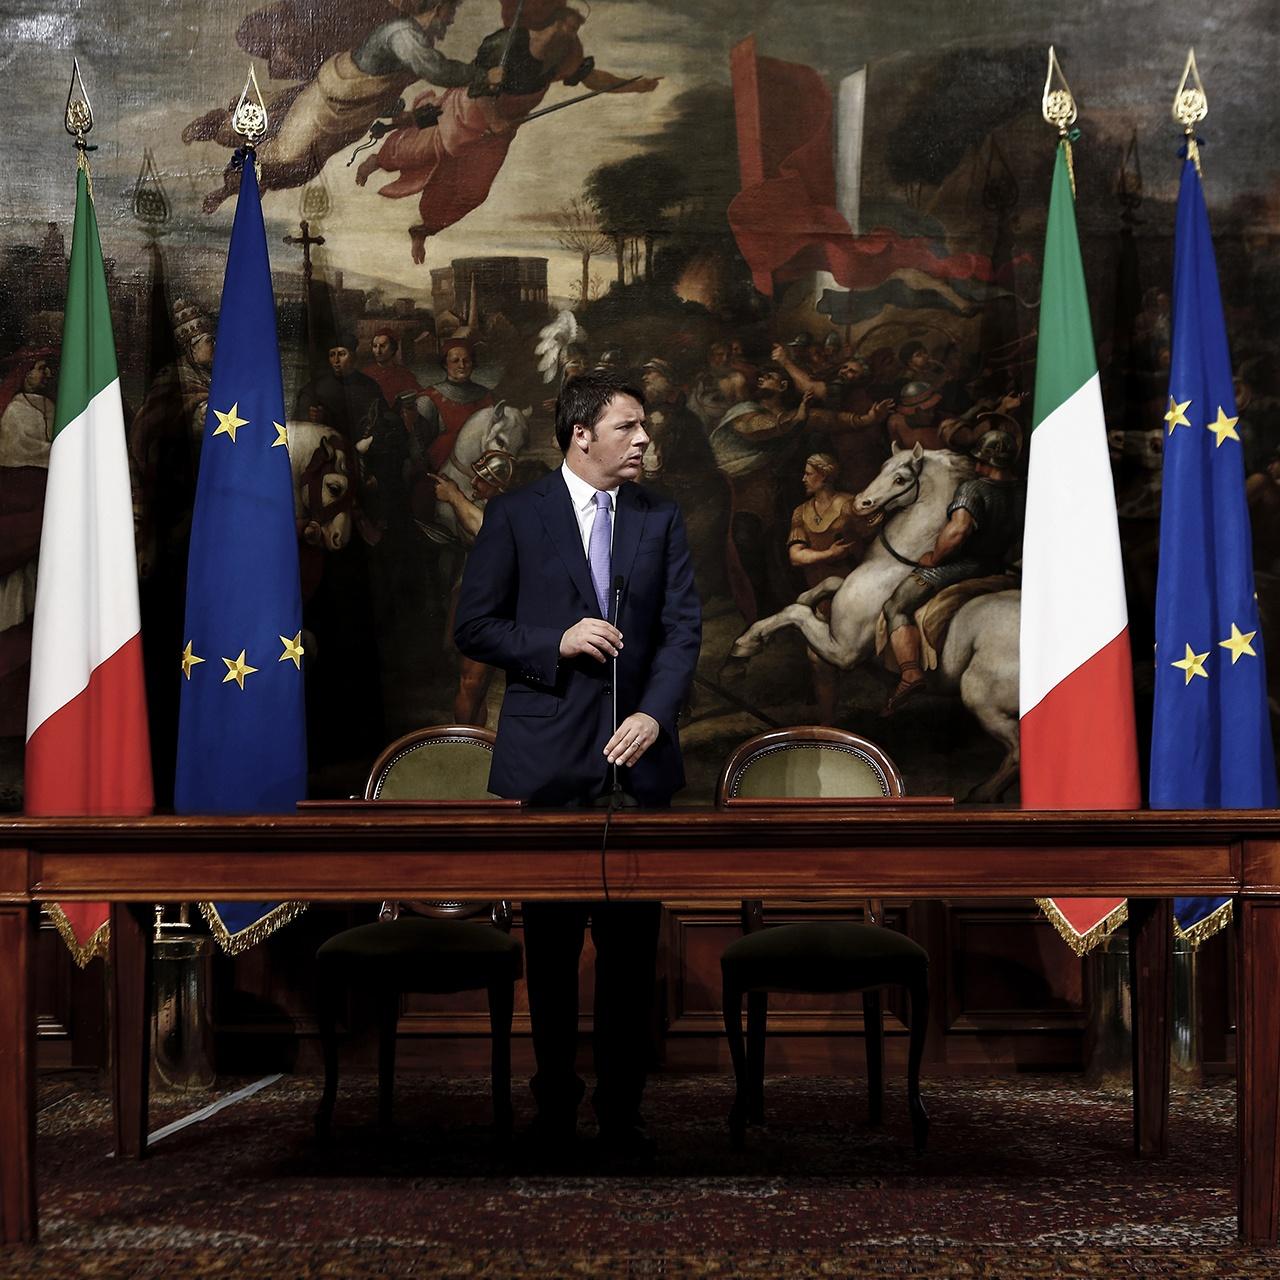 Italian PM, Matteo Renzi